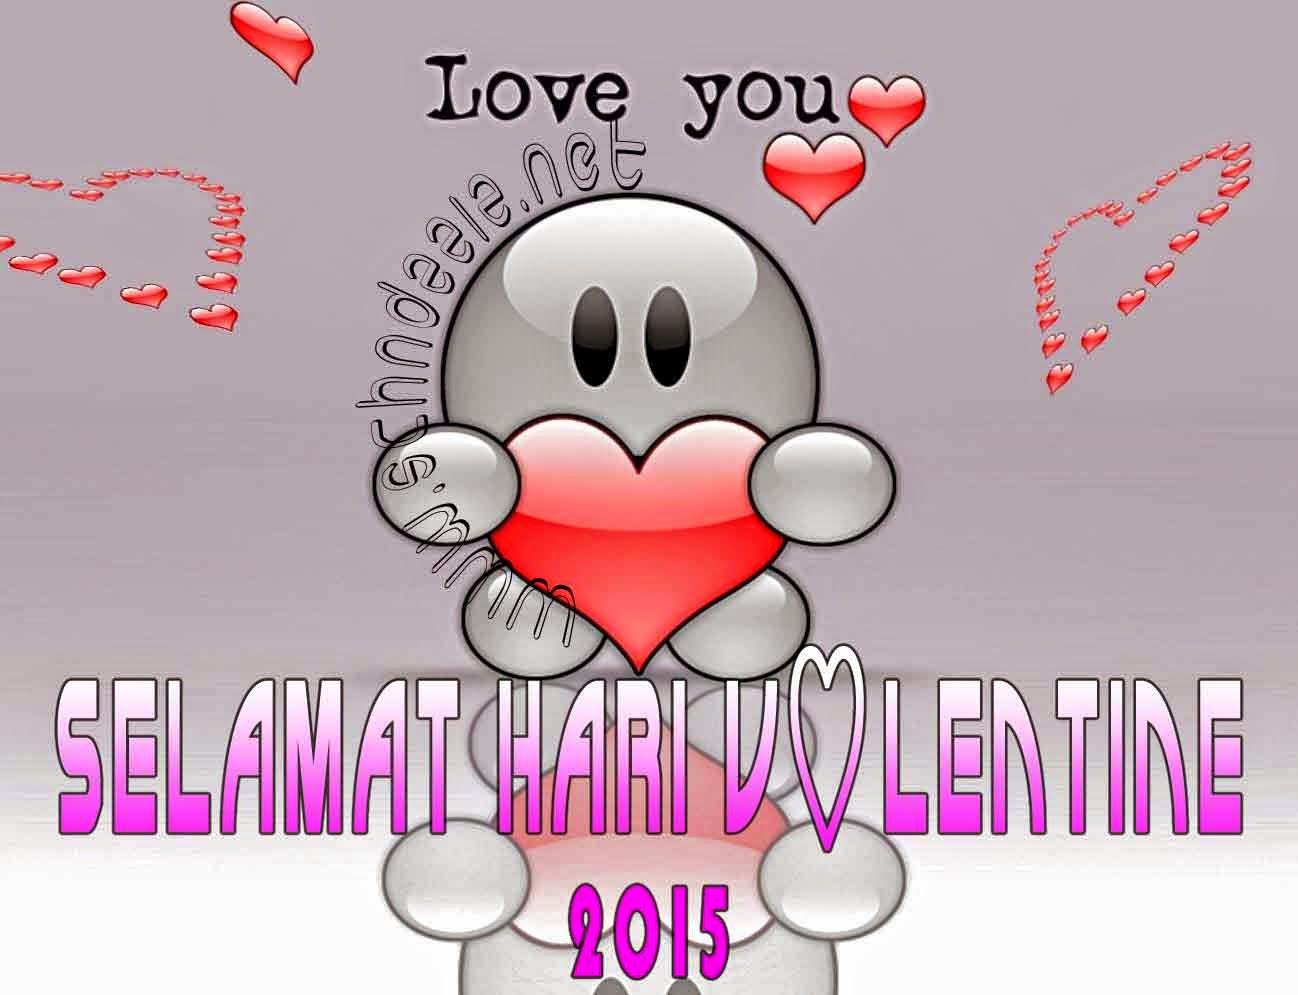 Gambar Kata Ucapan Romantis Animasi Valentine 2015